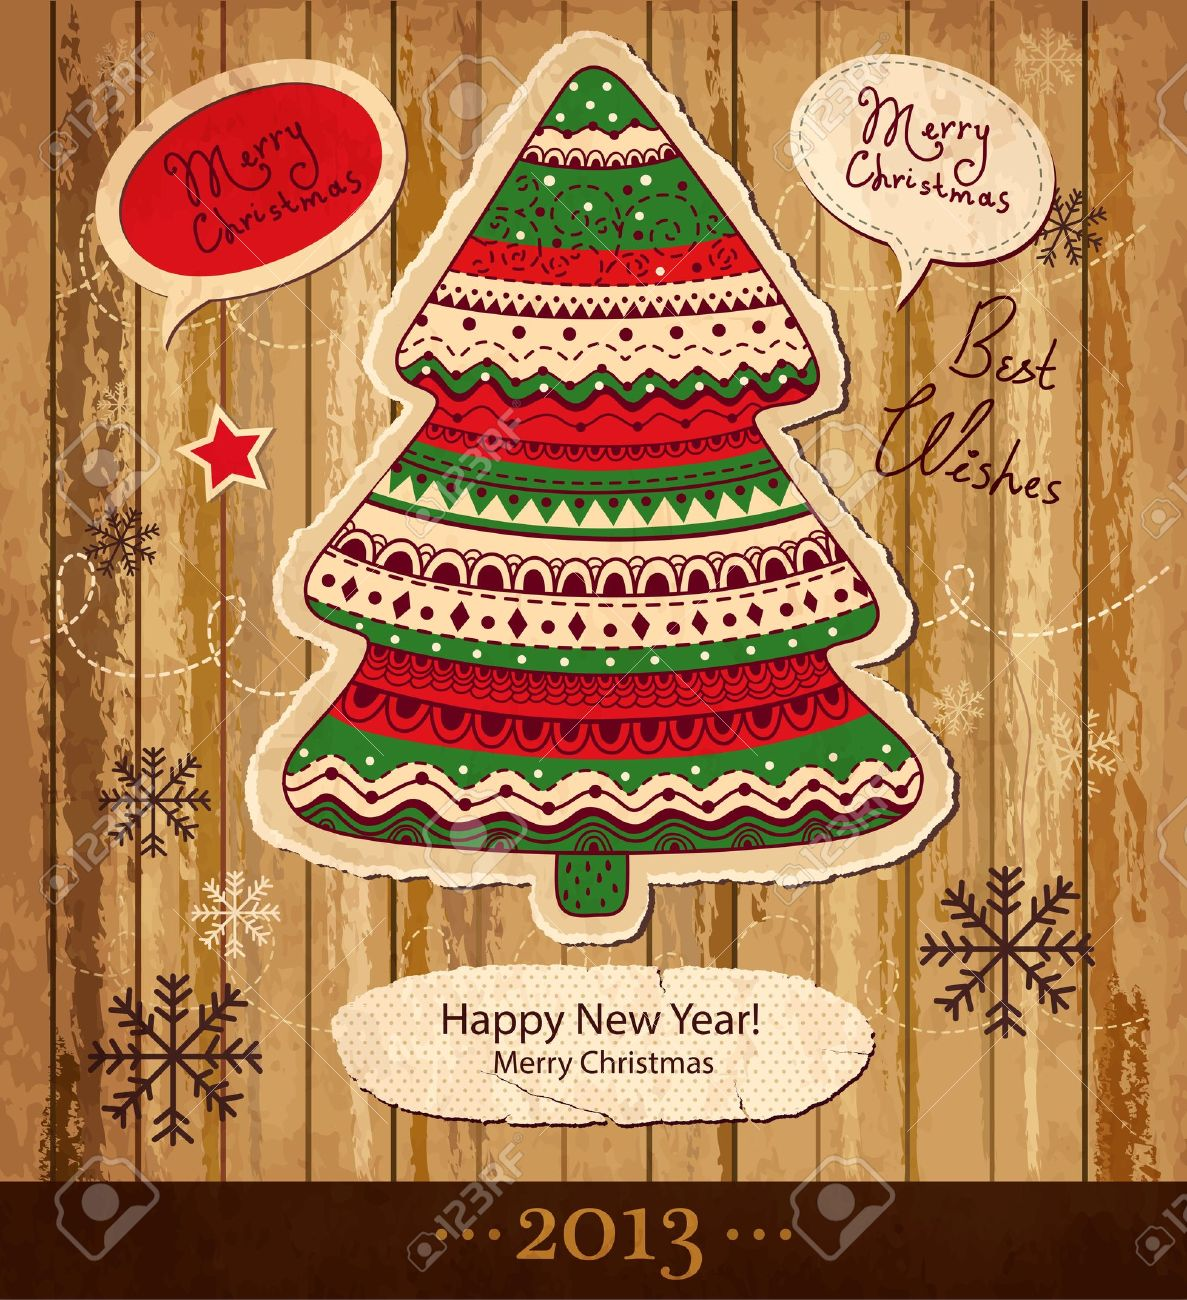 Vintage Christmas vector card with Christmas tree Stock Vector - 15646216